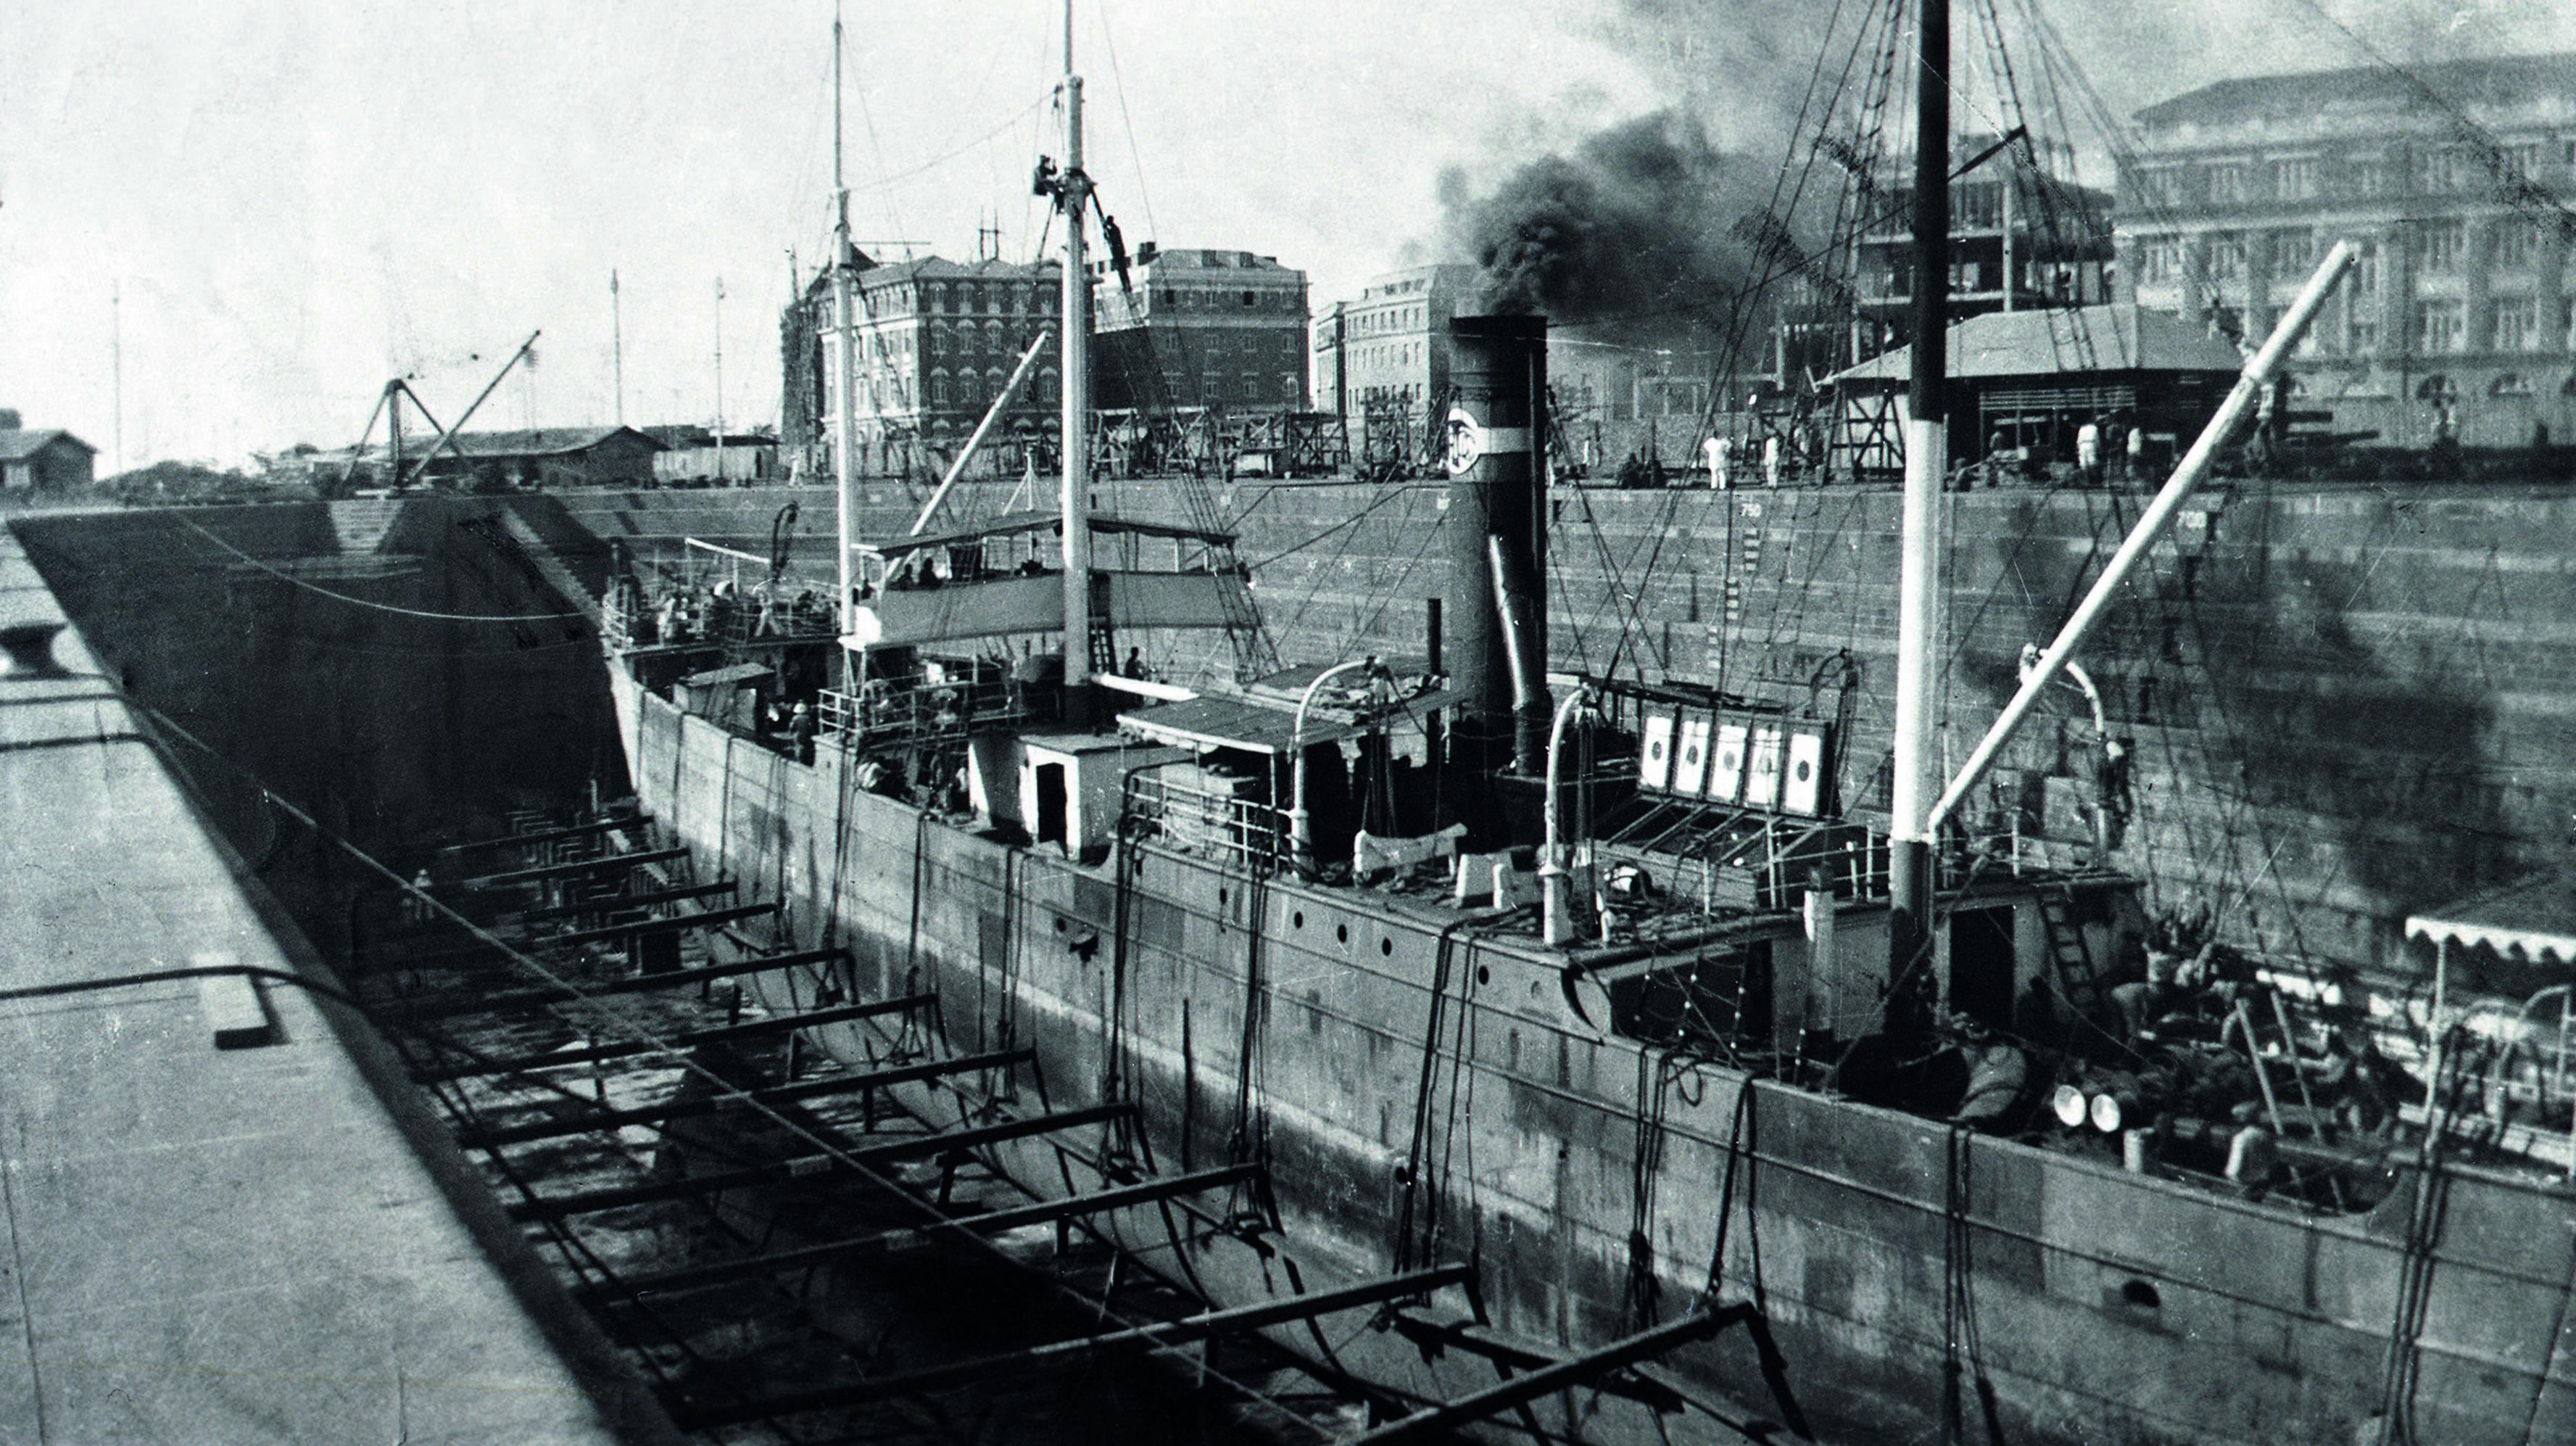 SS Ferrara Anglo-Persian Oil Company, 1912-1915